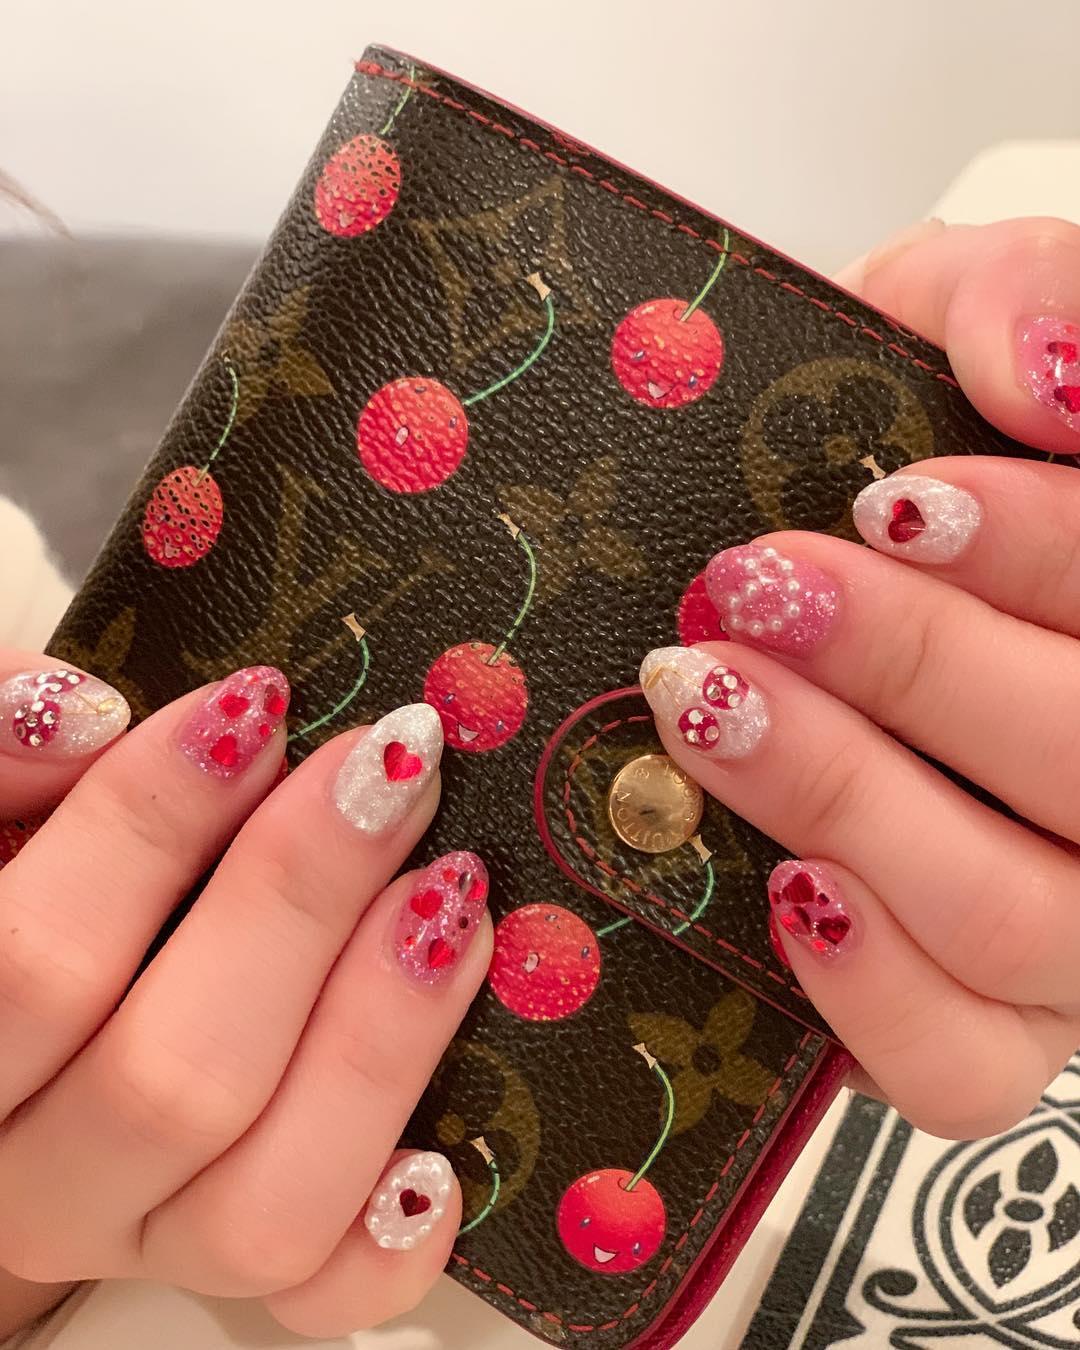 cool pink nail designs 2019 9 - 21 Cool Pink Nail Designs 2019